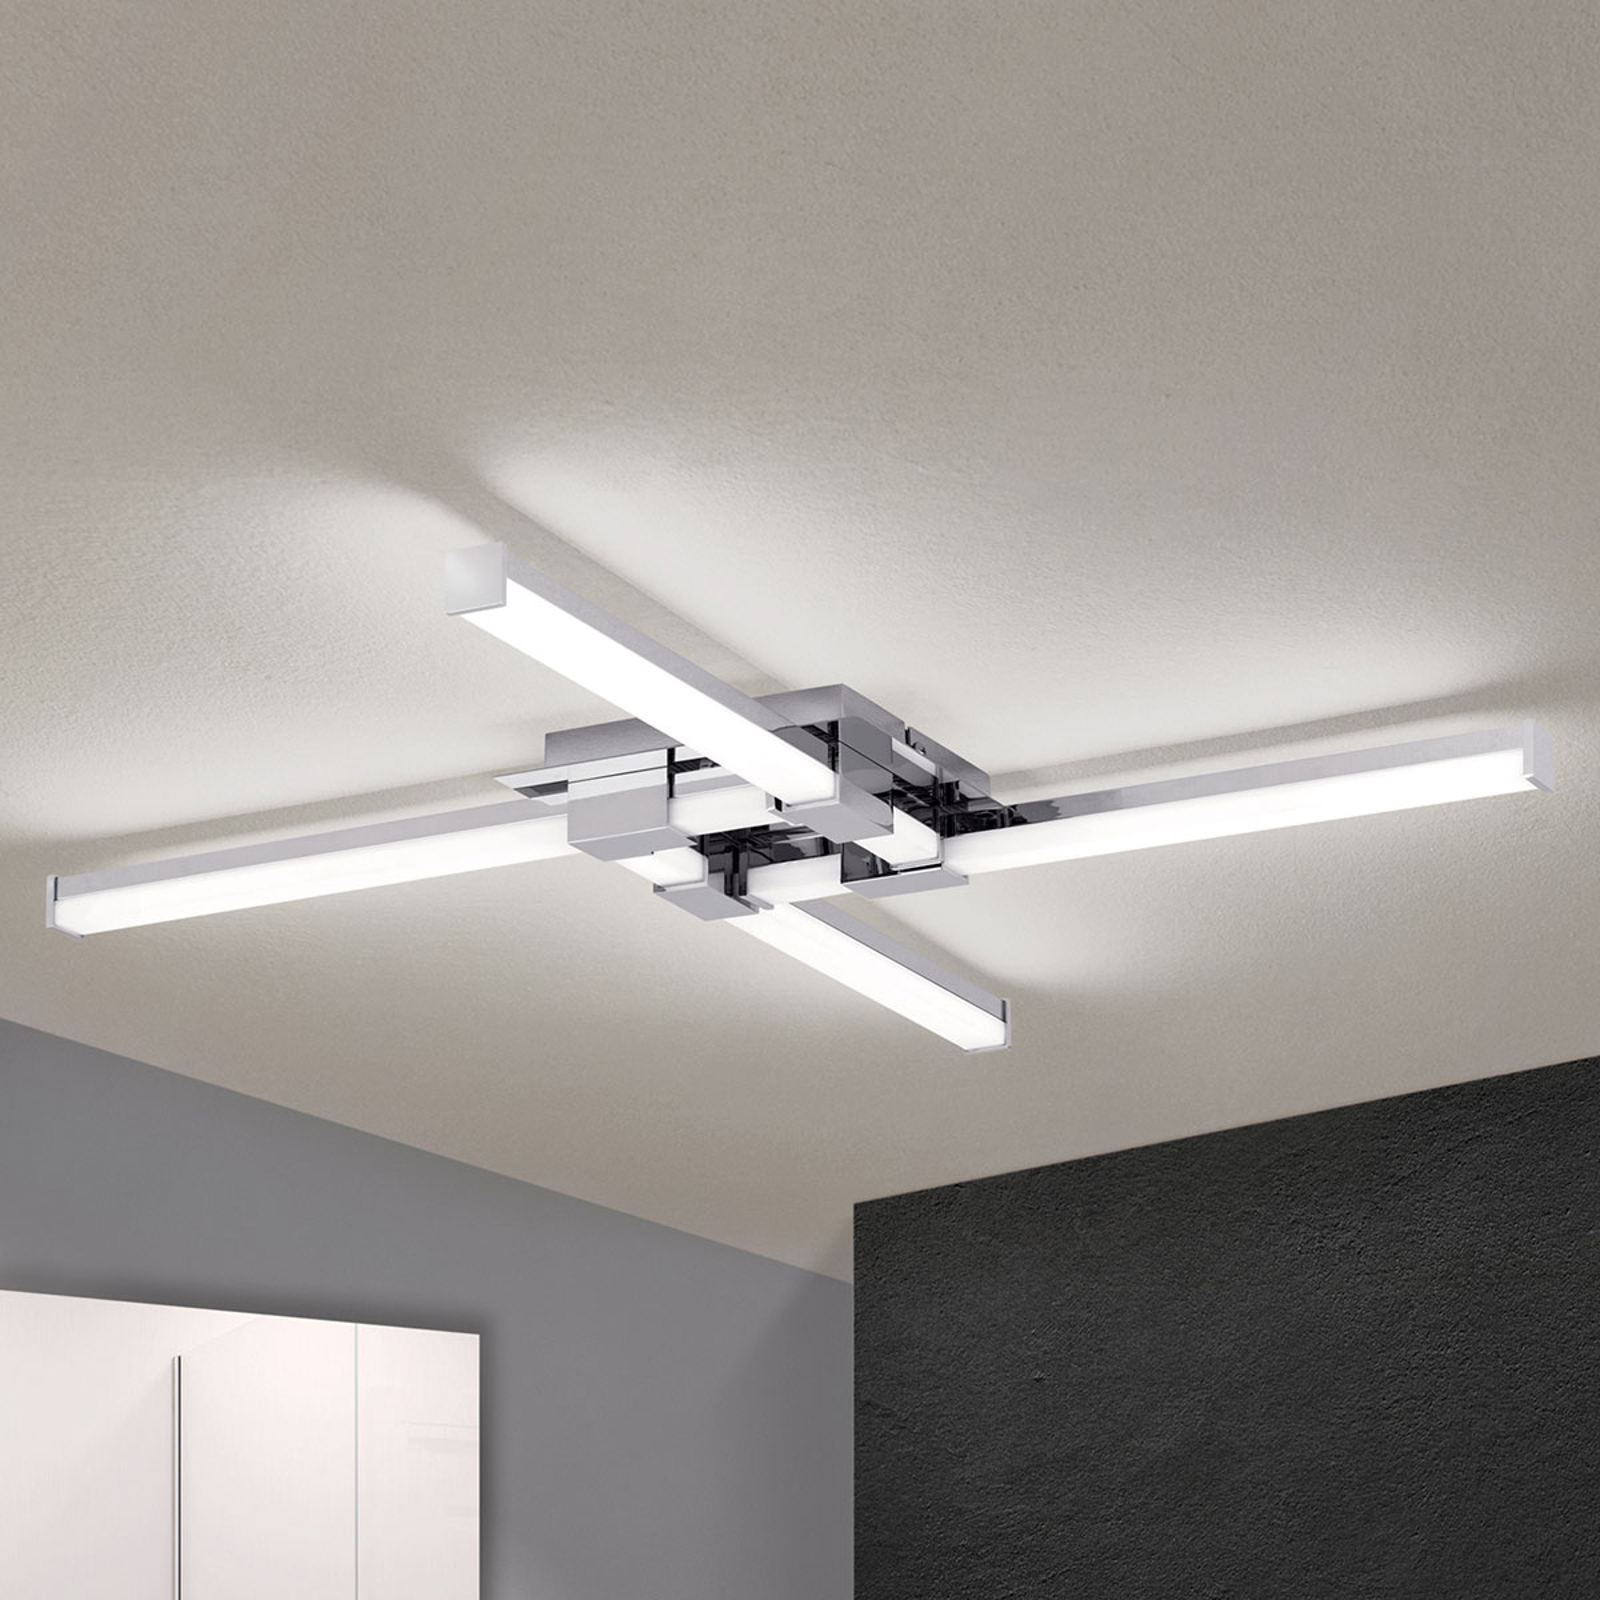 LED badkamer plafondlamp Argo met vier lampjes